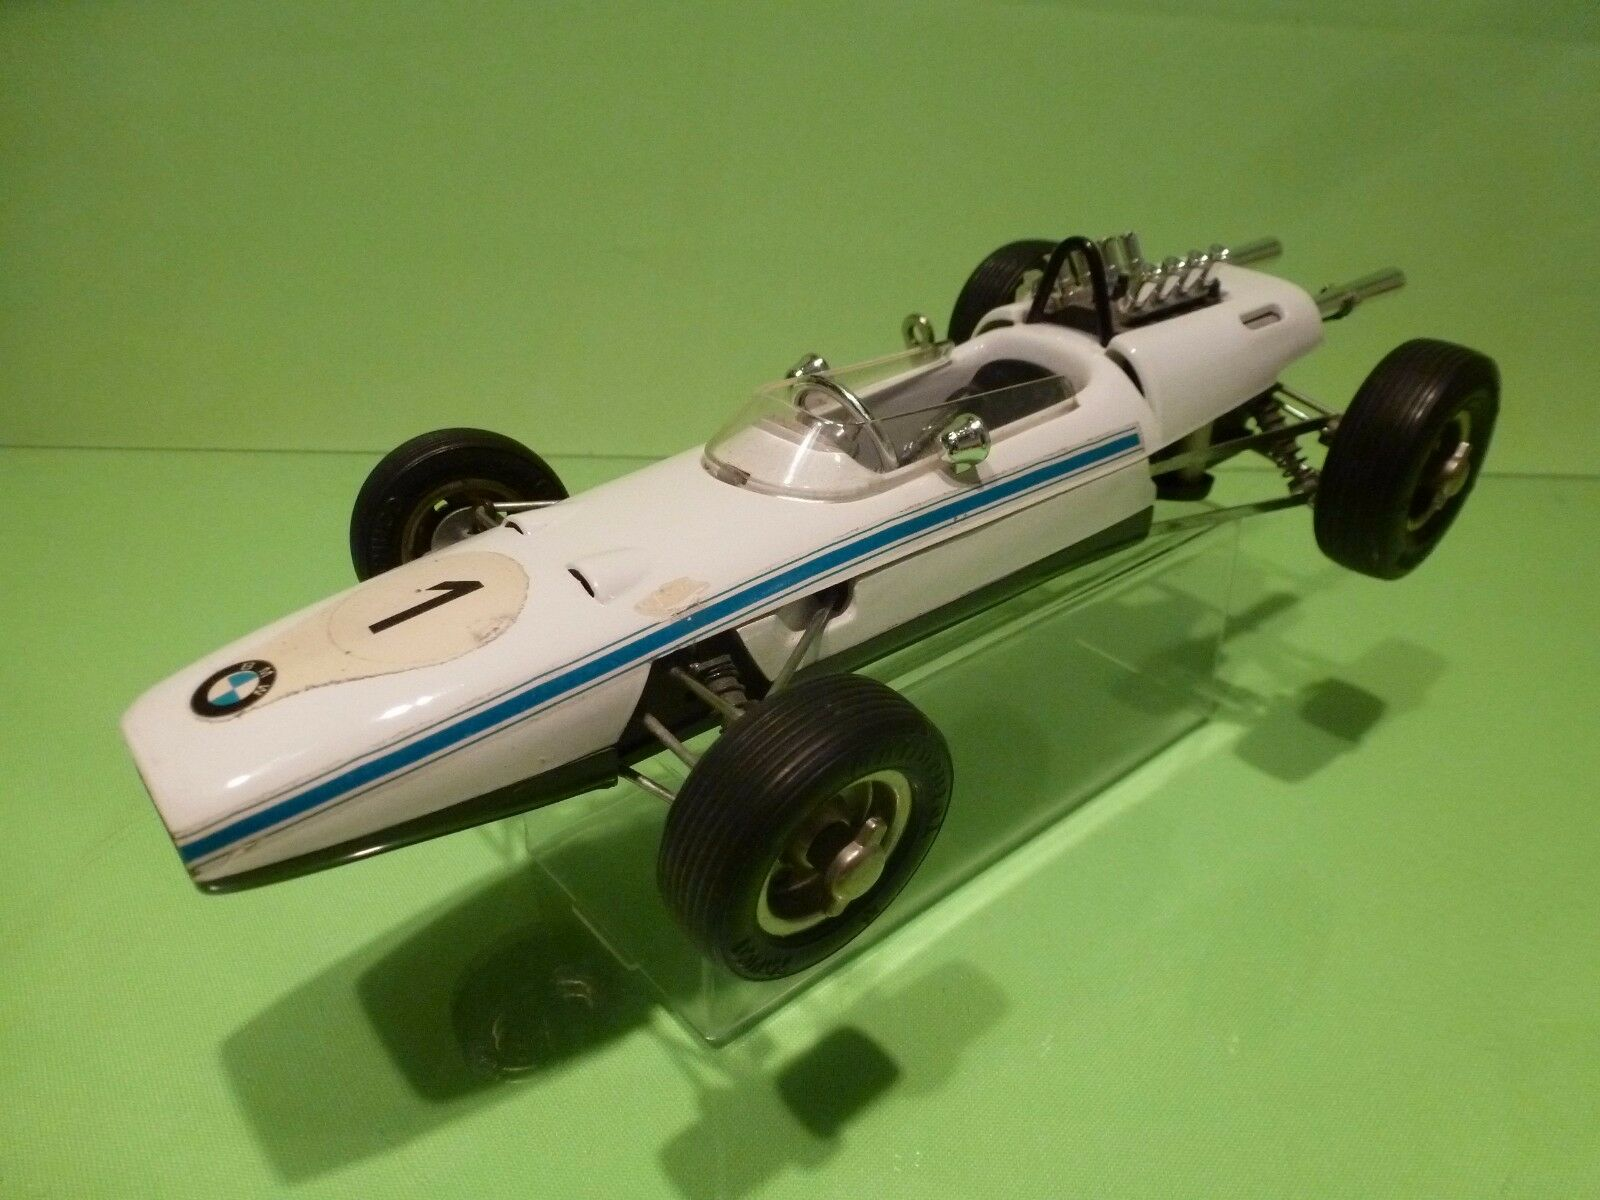 SCHUCO 1072  BMW FORMULA 2 RACE CAR - Blanco L25.0cm - GOOD CONDITION